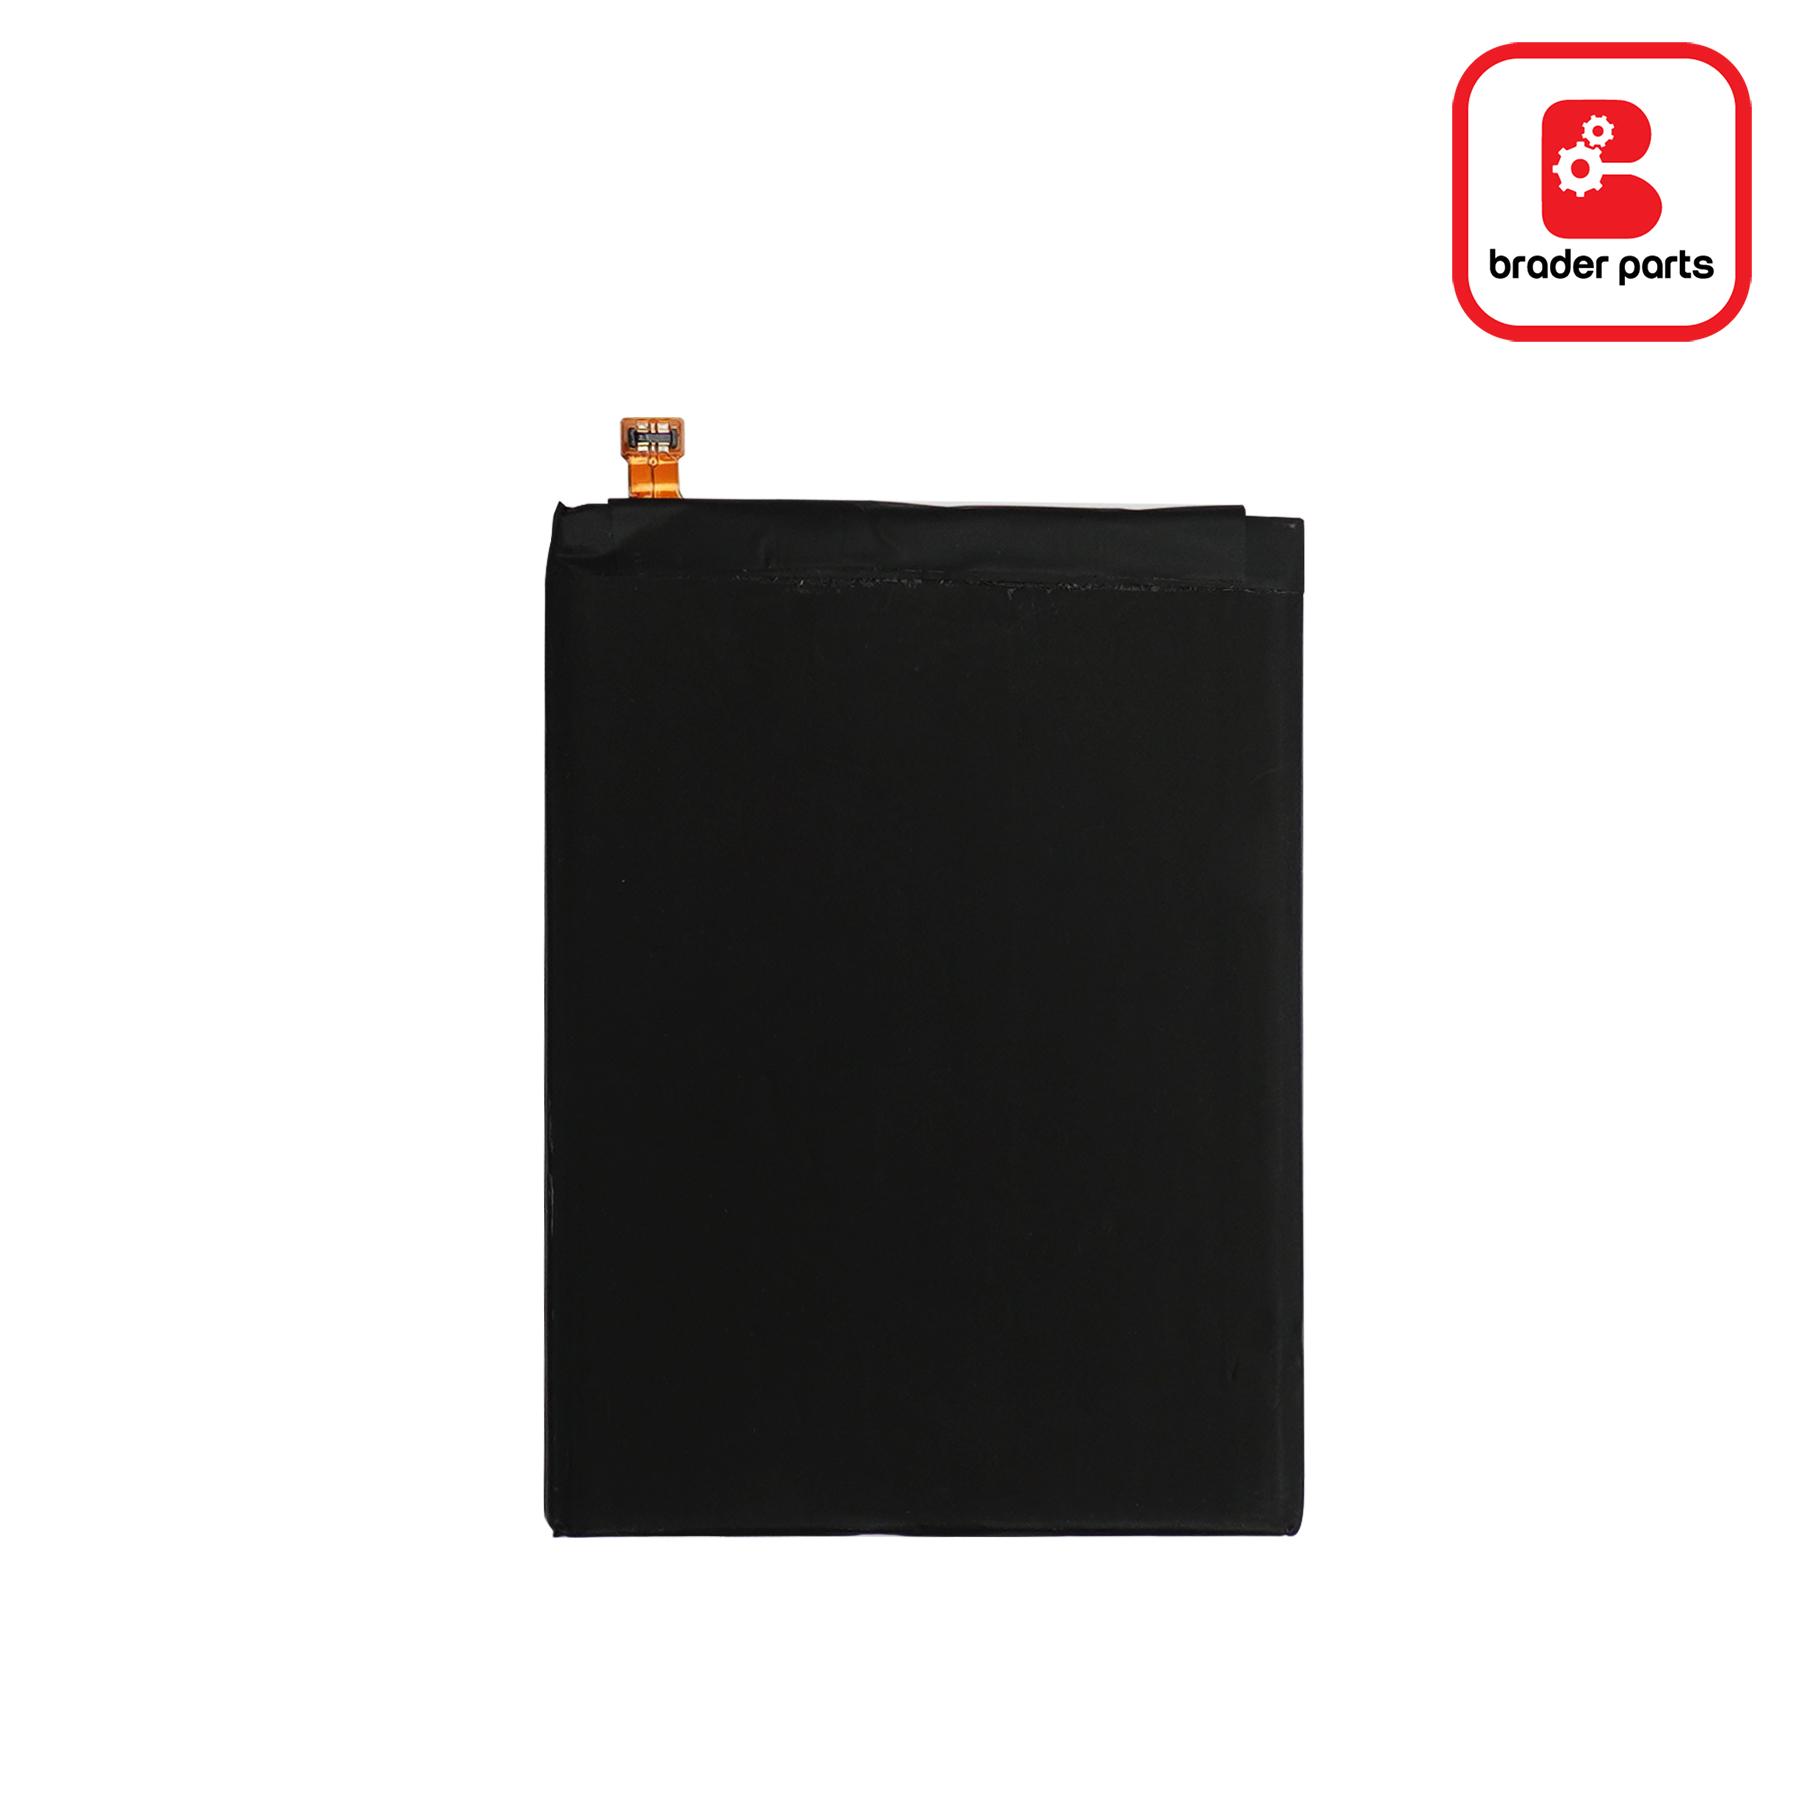 "Baterai Asus Zenfone 3 Max 5.2"""